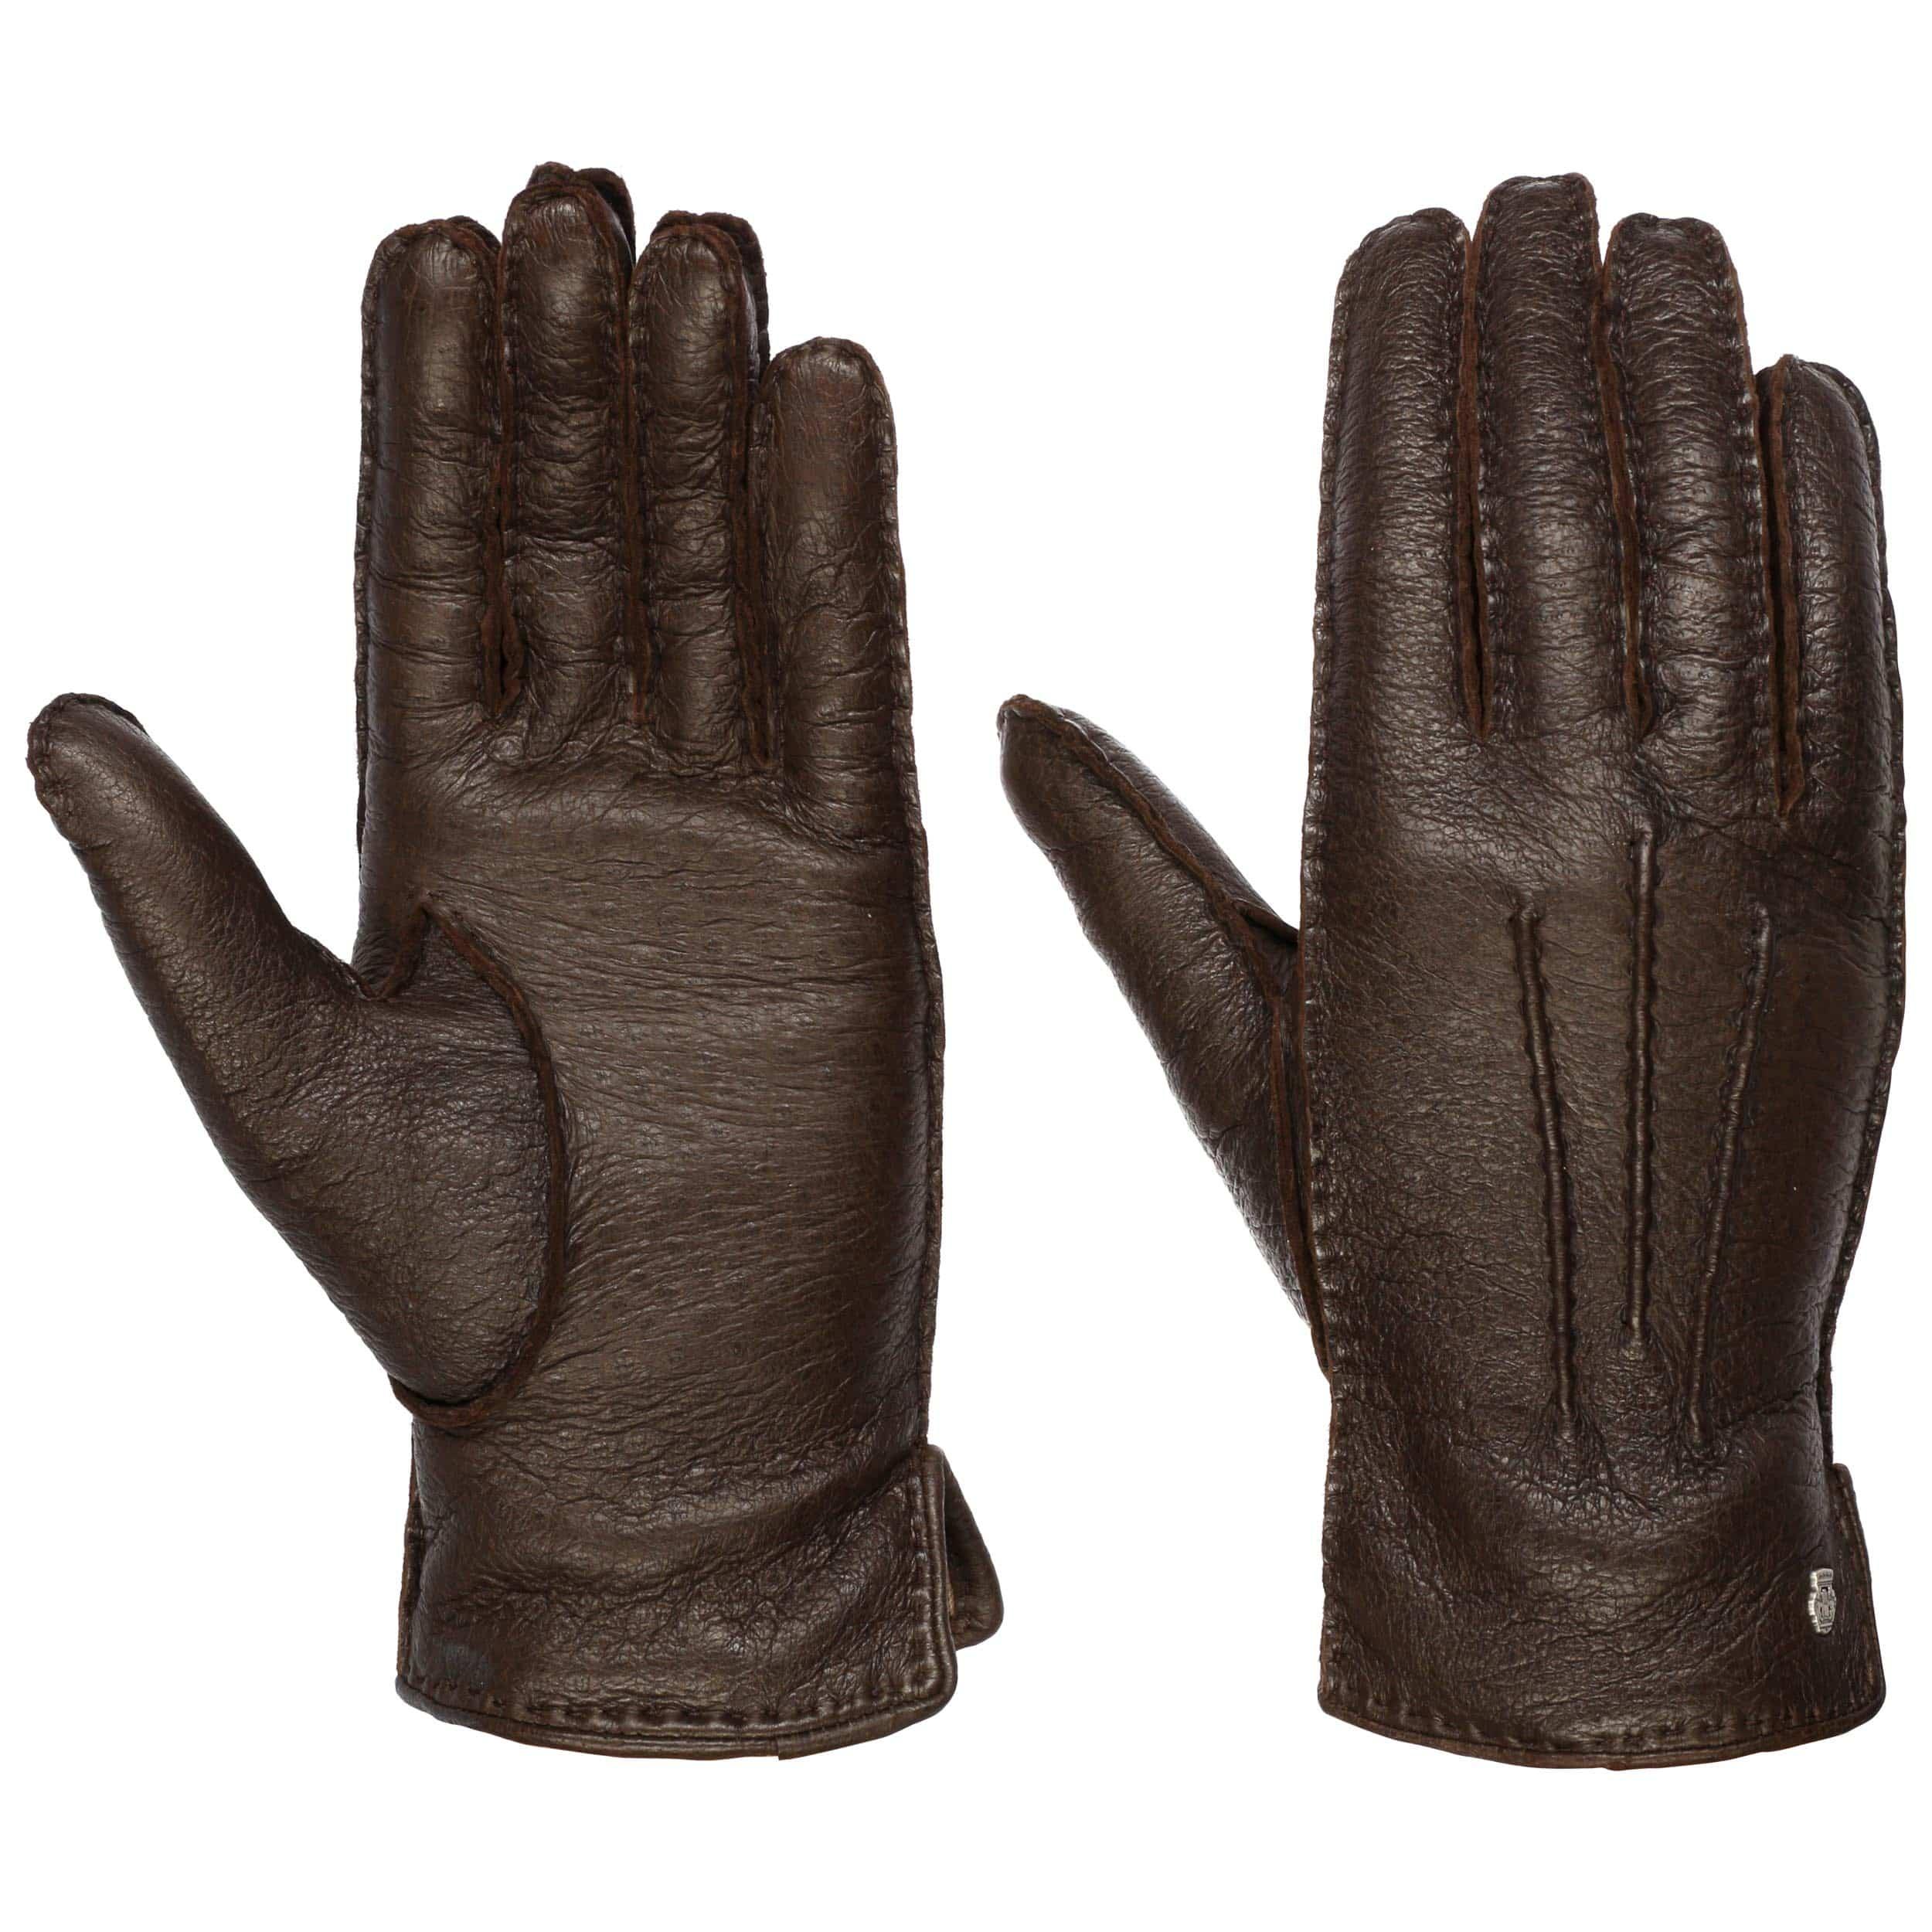 classic peccary leren handschoenen by roeckl, eur 169,00 \u003e hoedenclassic peccary leren handschoenen by roeckl donkerbruin 4